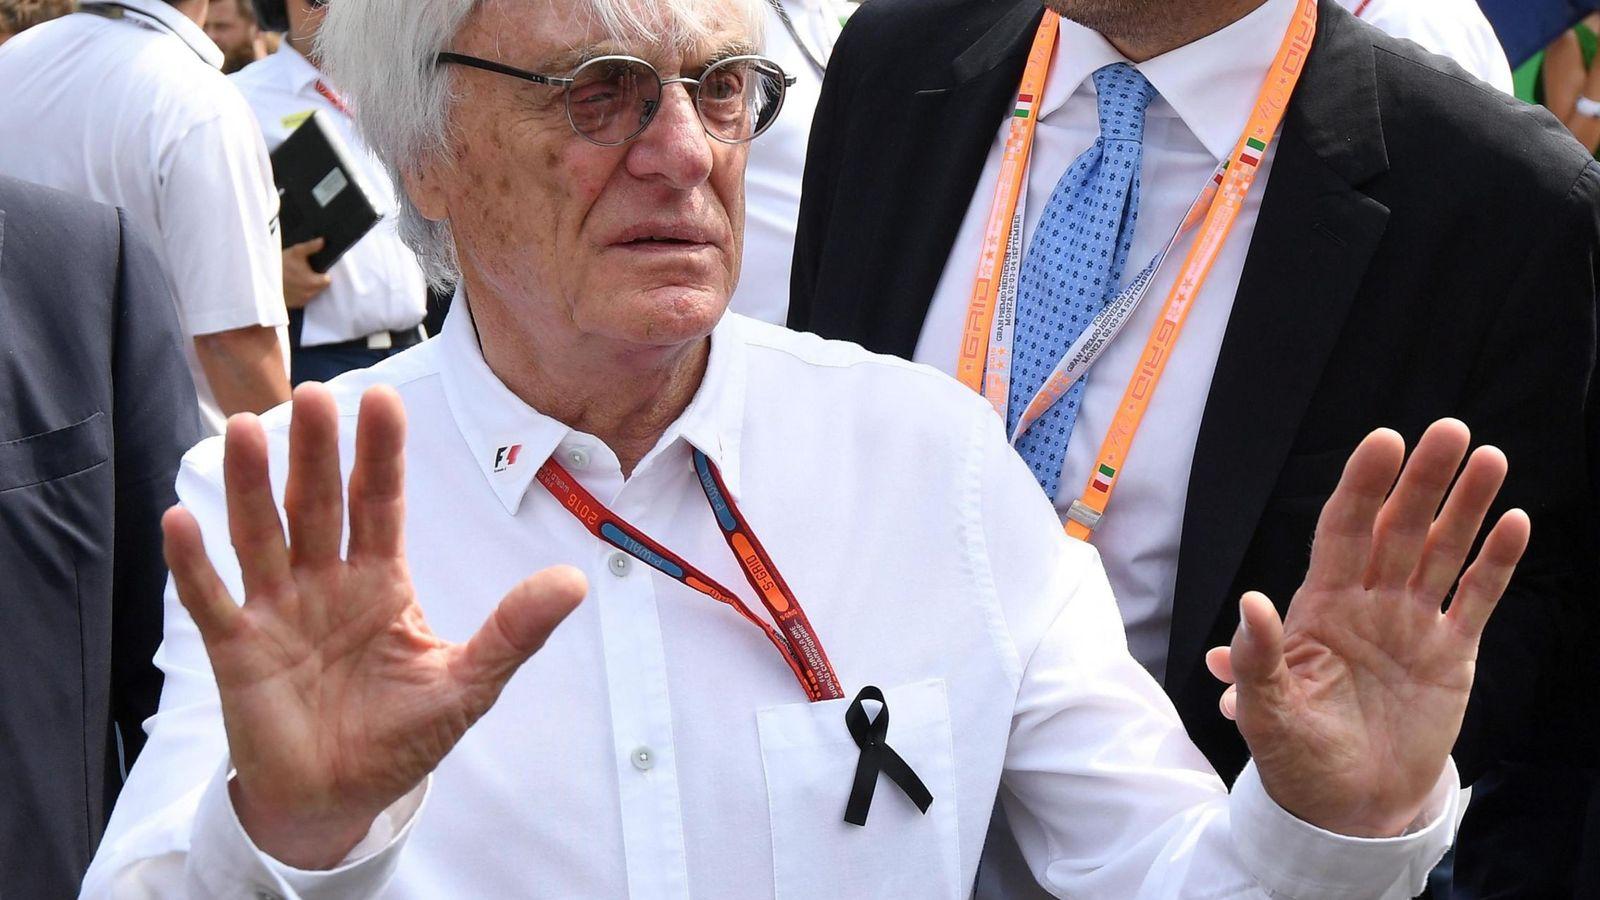 Foto: Bernie Ecclestone, este pasado fin de semana en Italia.